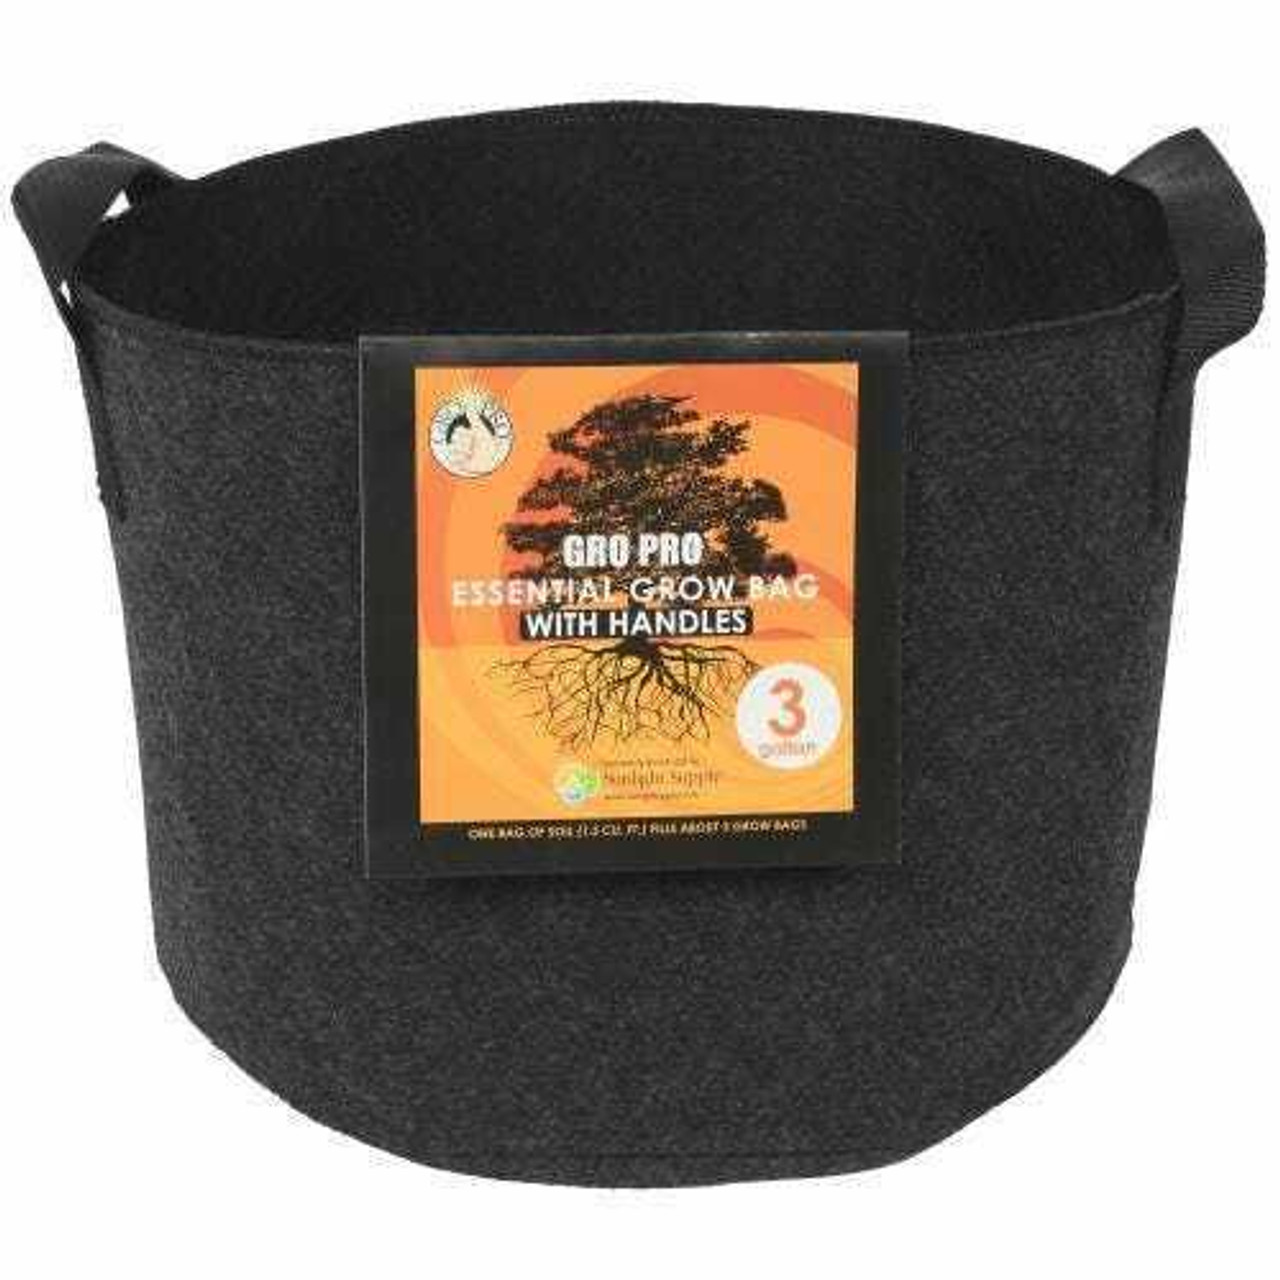 Gro Pro Essential Round Fabric Pot w/ Handles 3 Gallon - Black